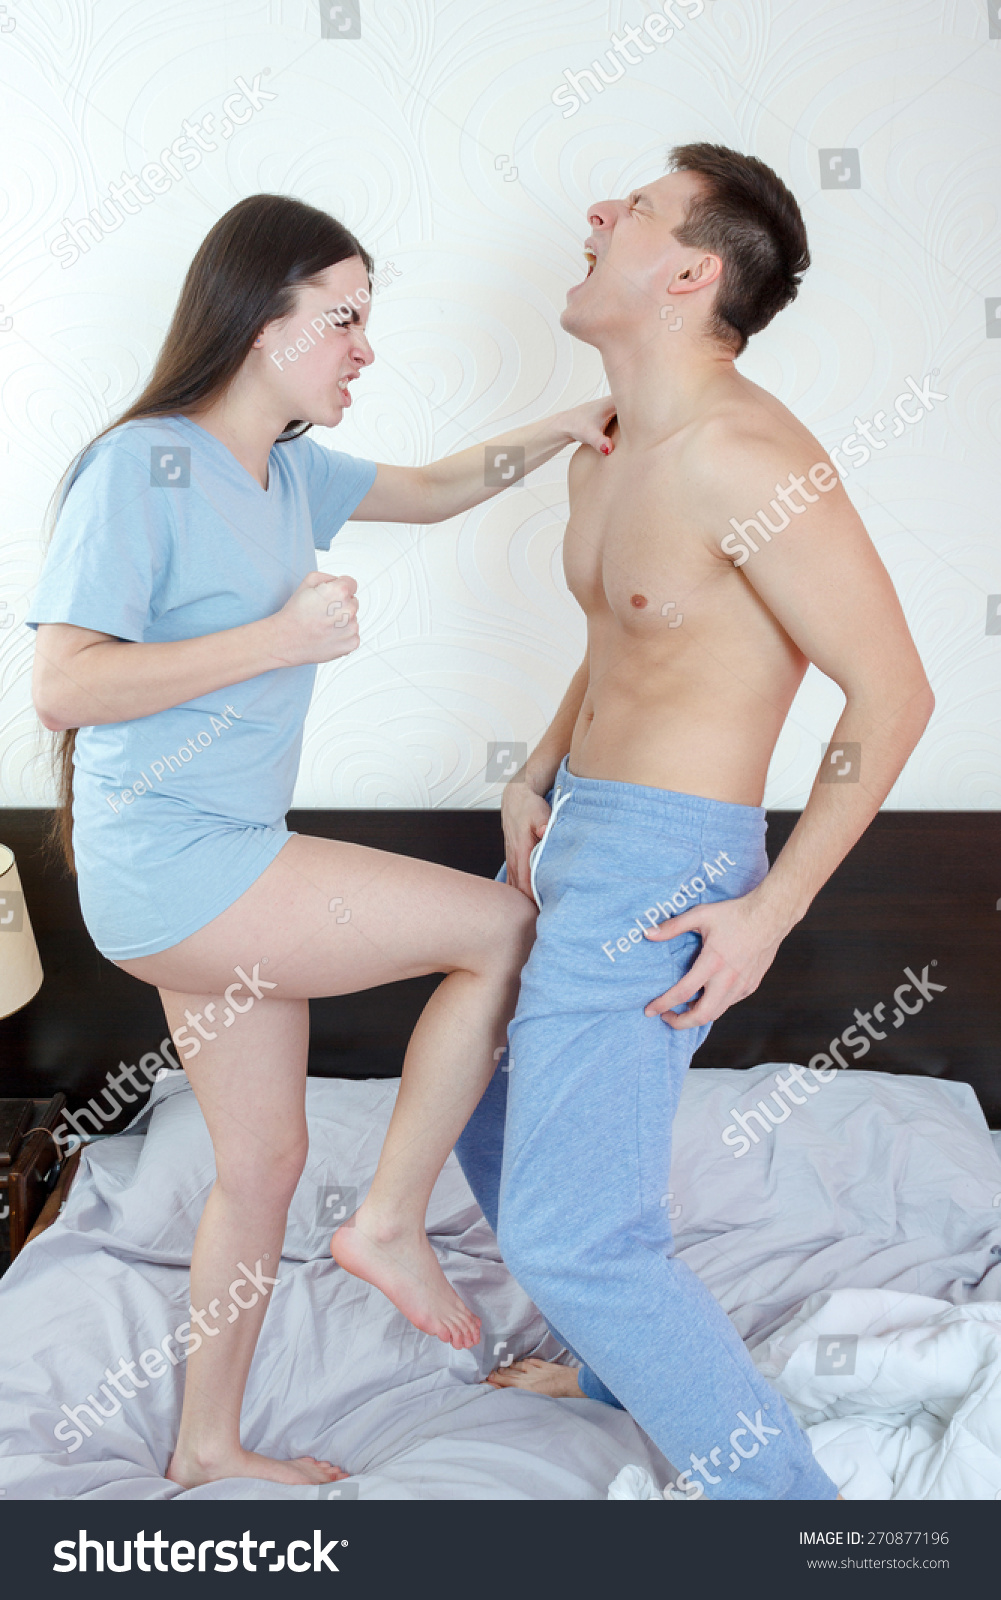 Photo Young Angry Woman Panties Kicking Stock Photo 270877196 - Shutterstock-4119